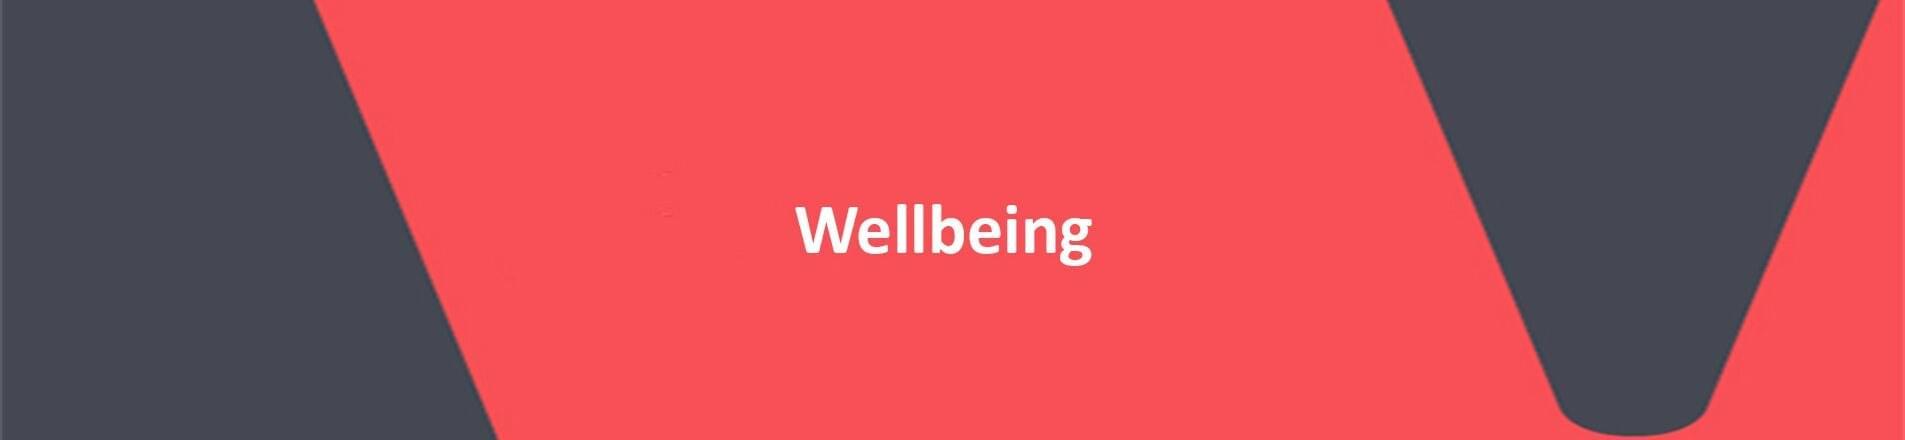 Wellbeing on red VERCIDA background